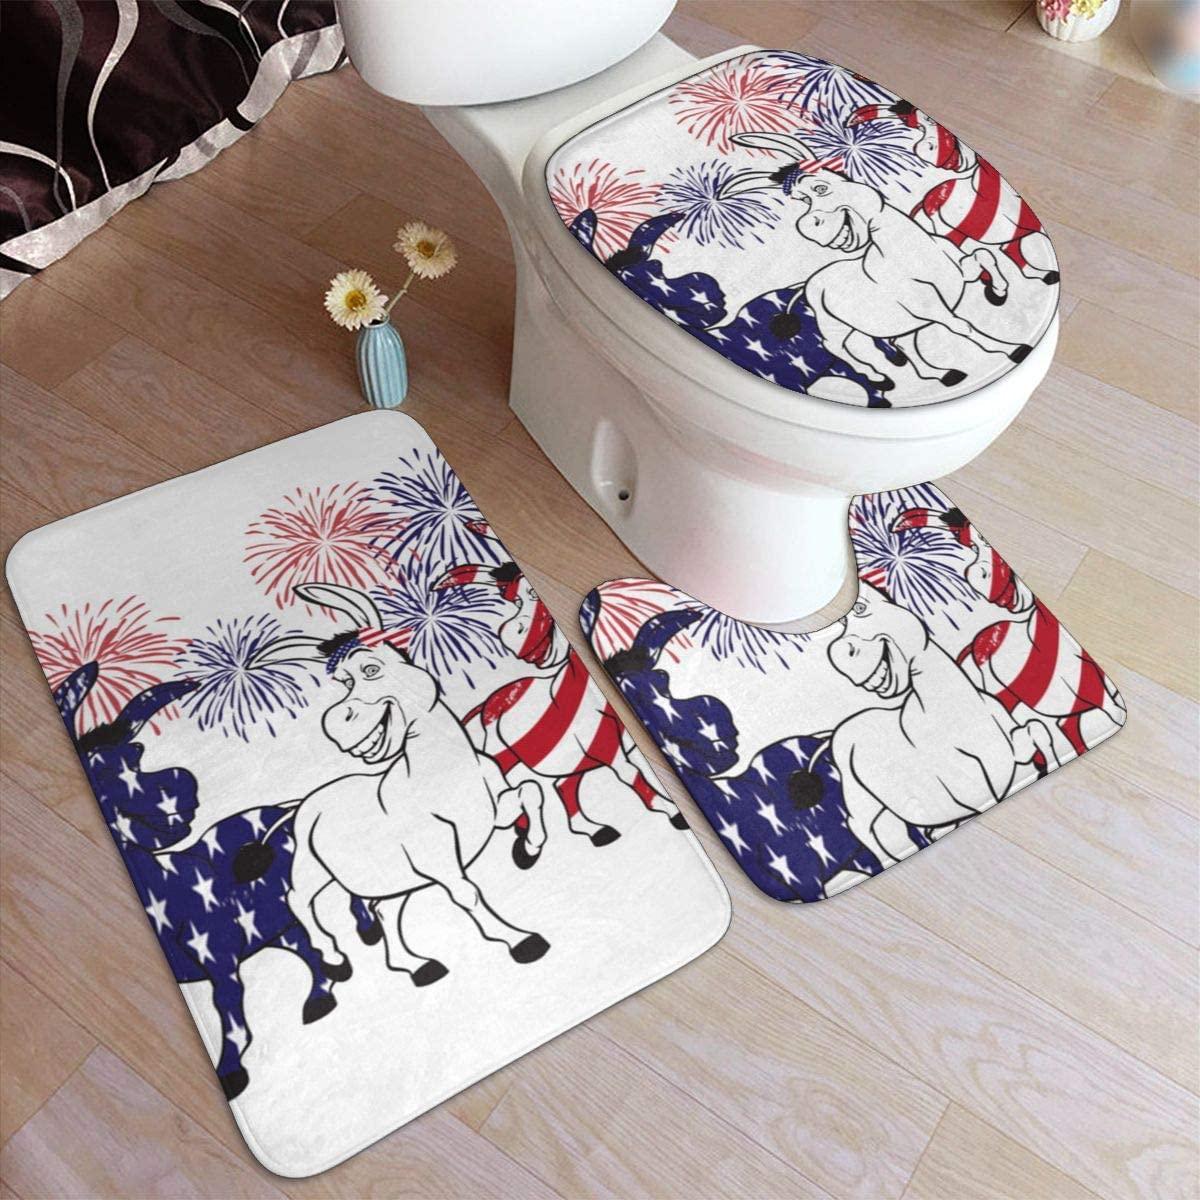 American Celebration 3 Pieces Bathroom Rug Set,Bath Shower Mats Doormat, U-Shaped Toilet Rug, Toilet Lid Cover